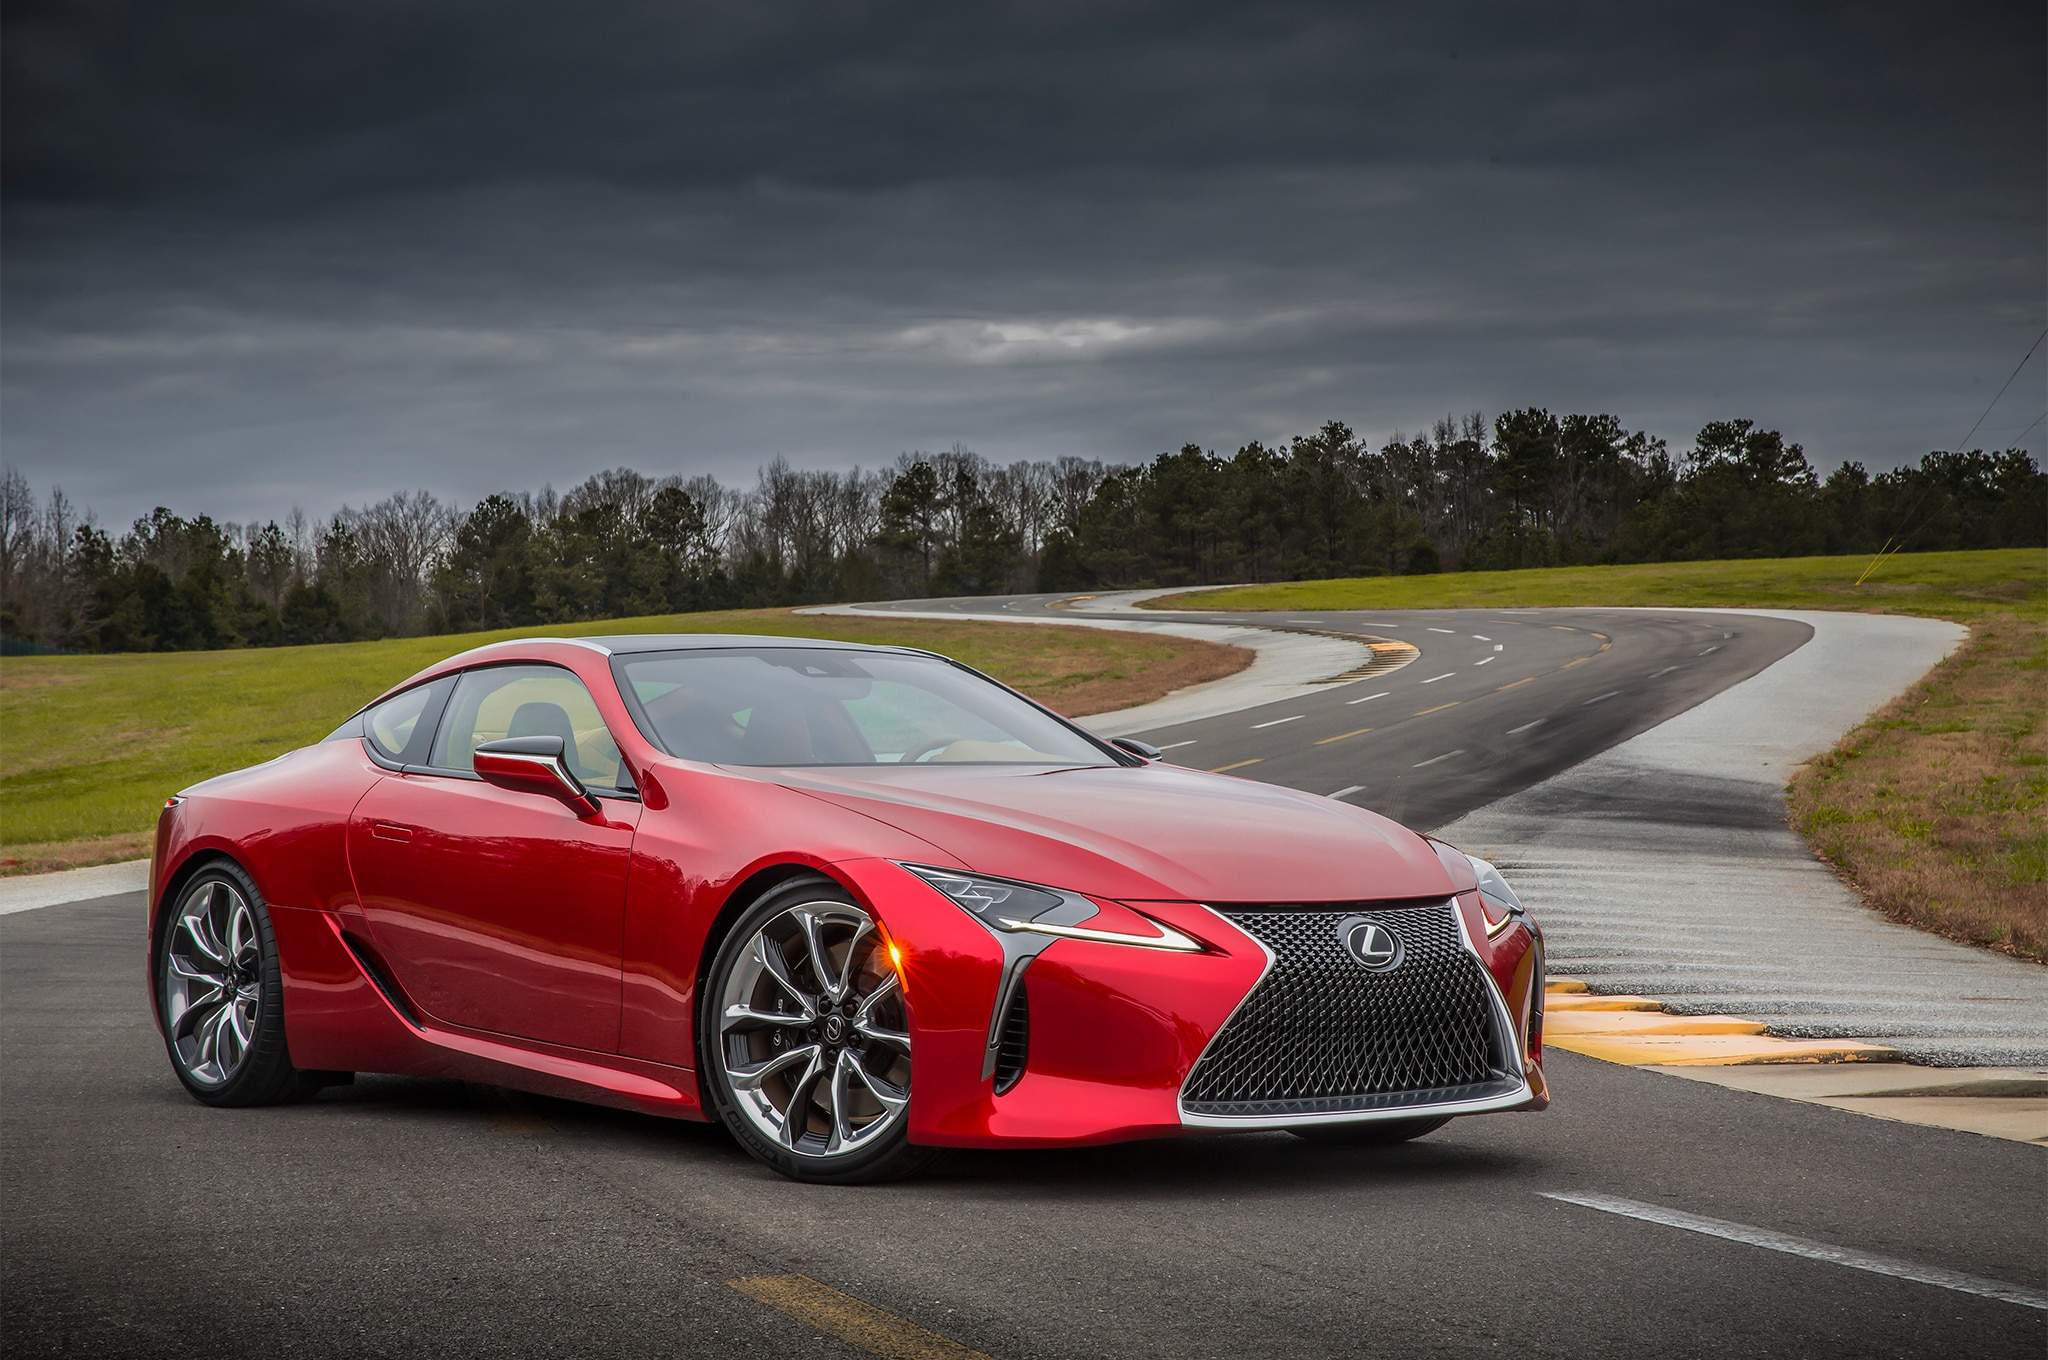 Lexus Launching No Haggle Pricing at Certain Dealerships